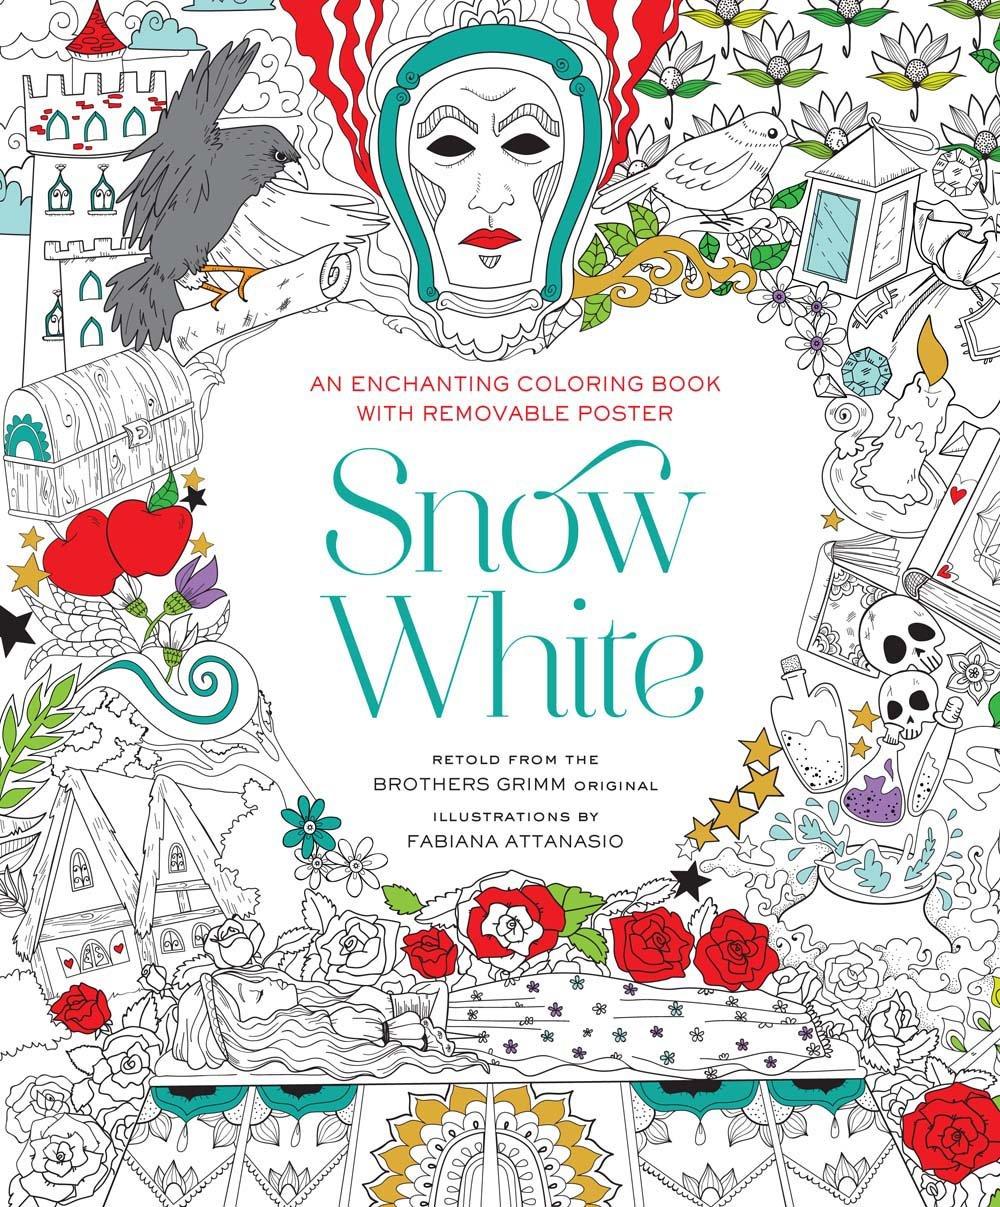 Snow White Coloring Book - Fabiana Attanasio - Sněhurka a sedm trpaslíků